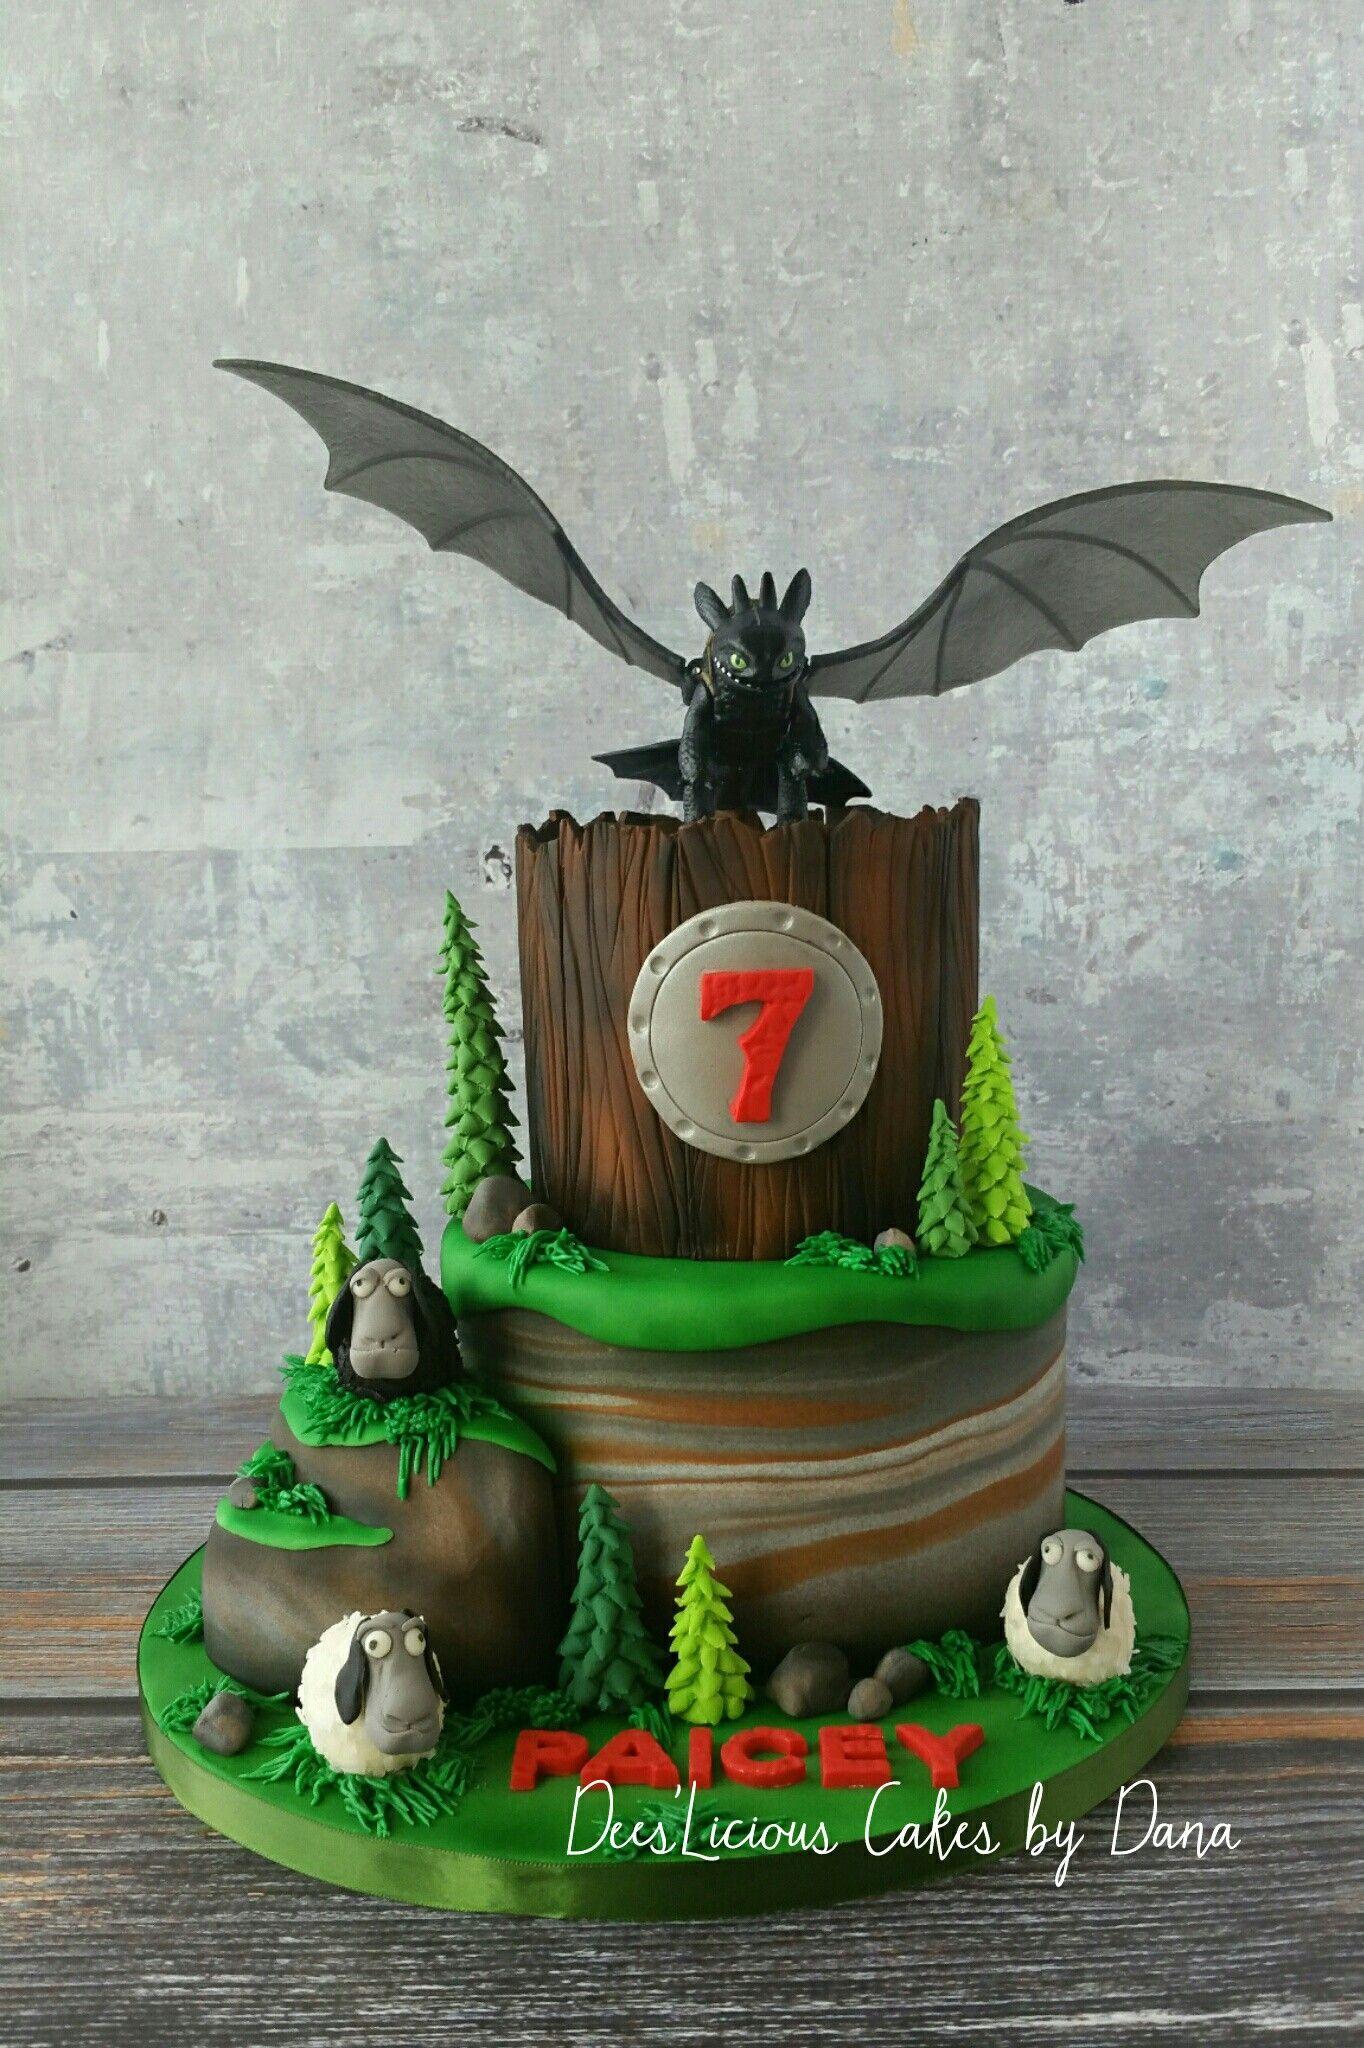 How To Train Your Dragon Dragon Birthday Cakes Dragon Cupcakes